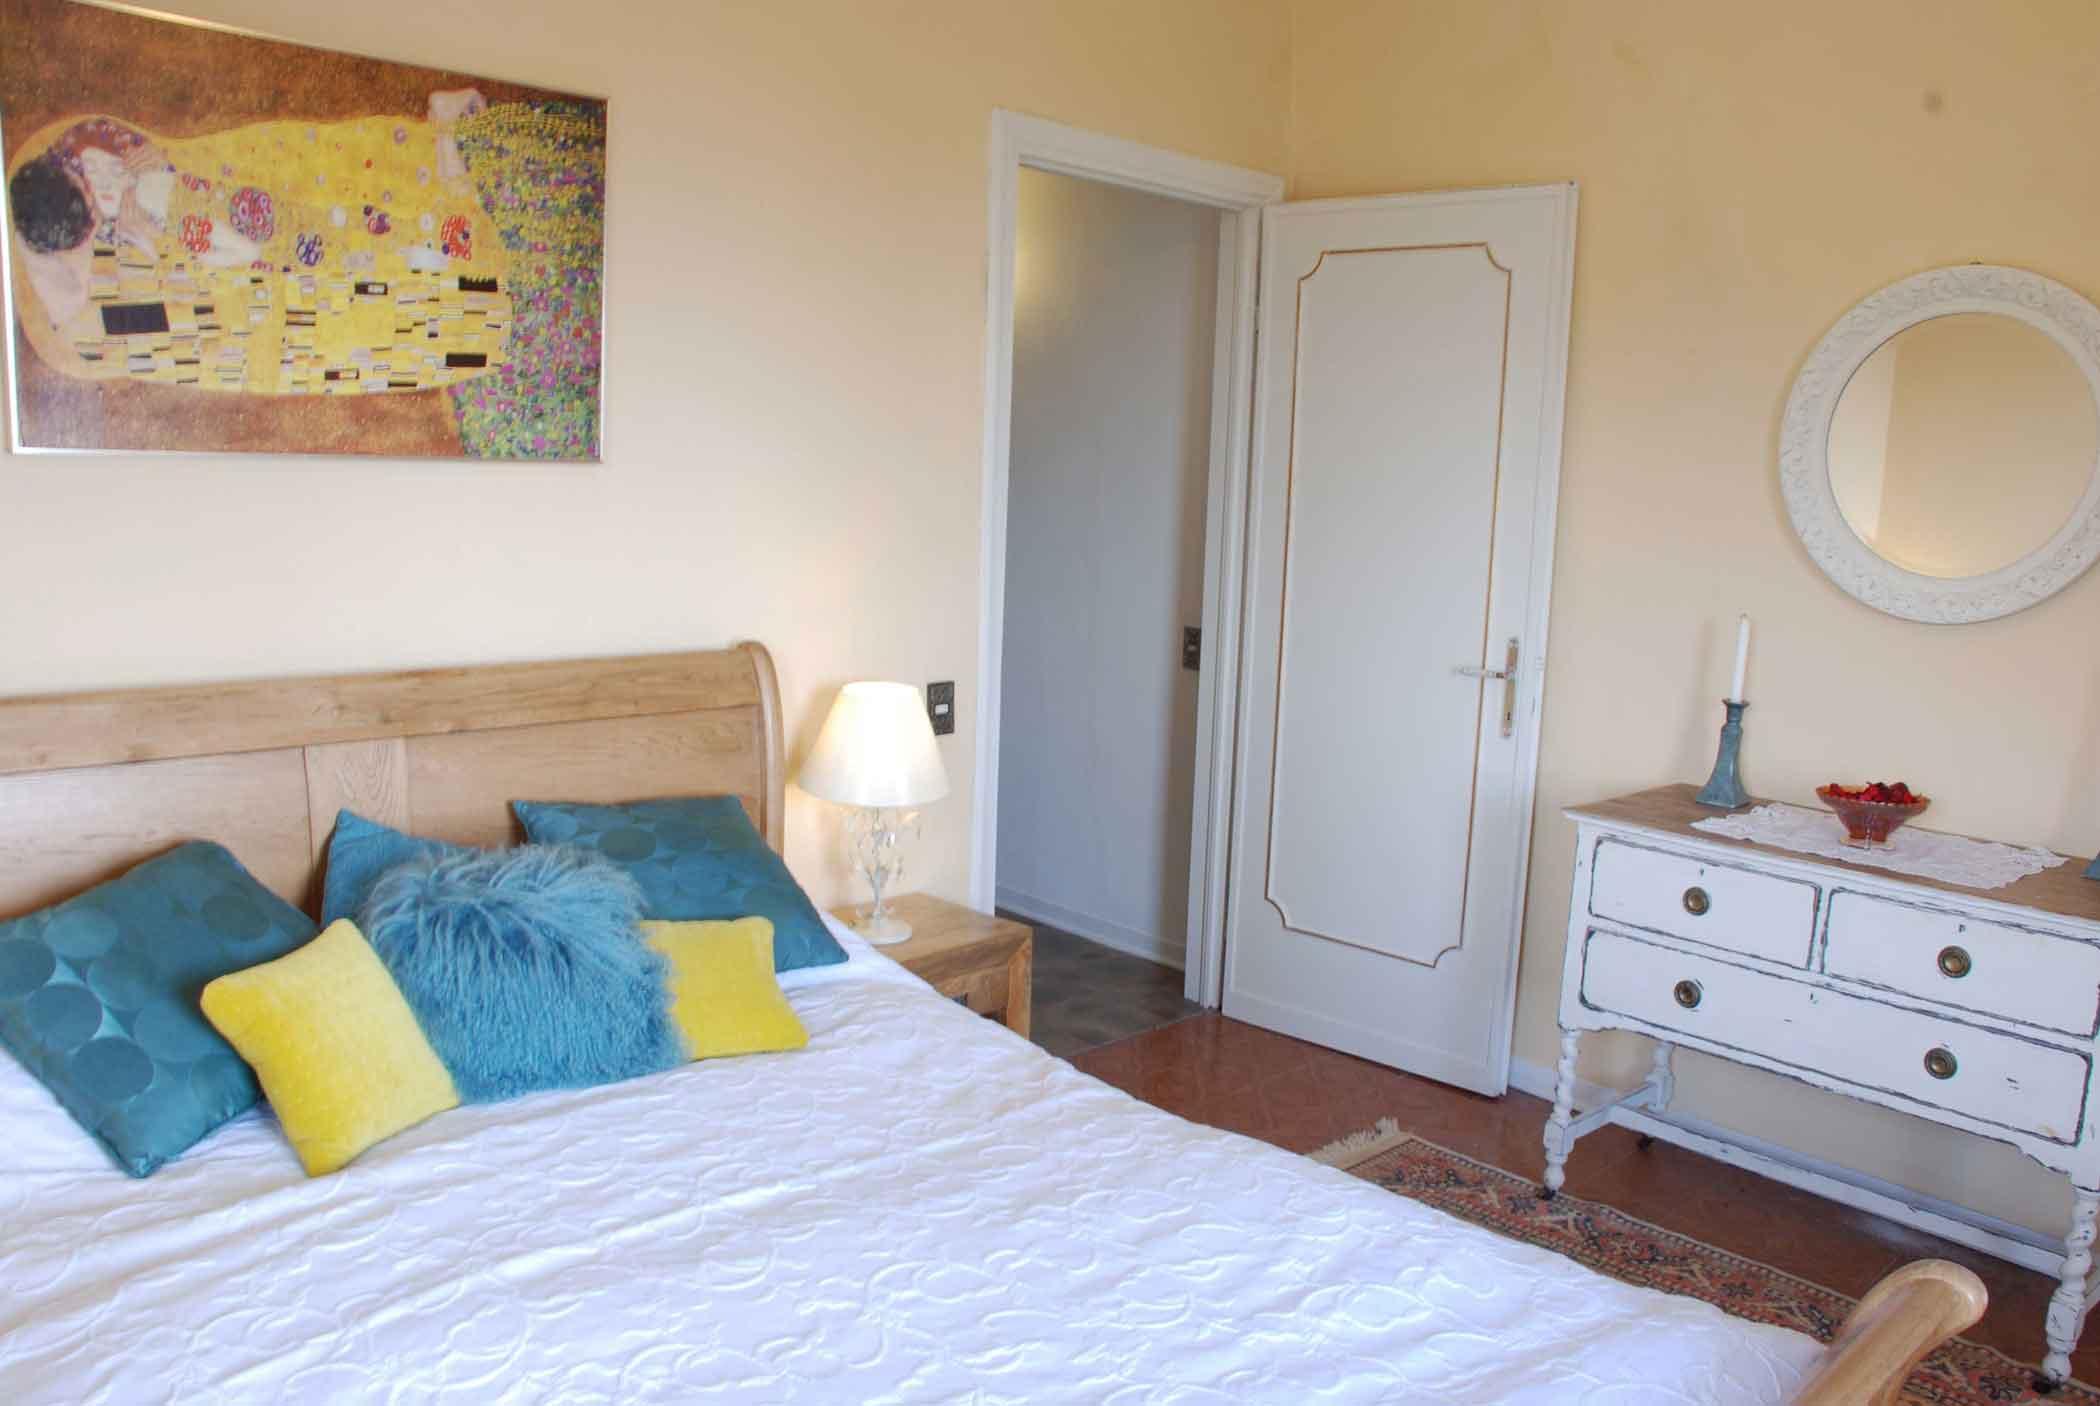 Best Websites For Tuscan Villas To Rent